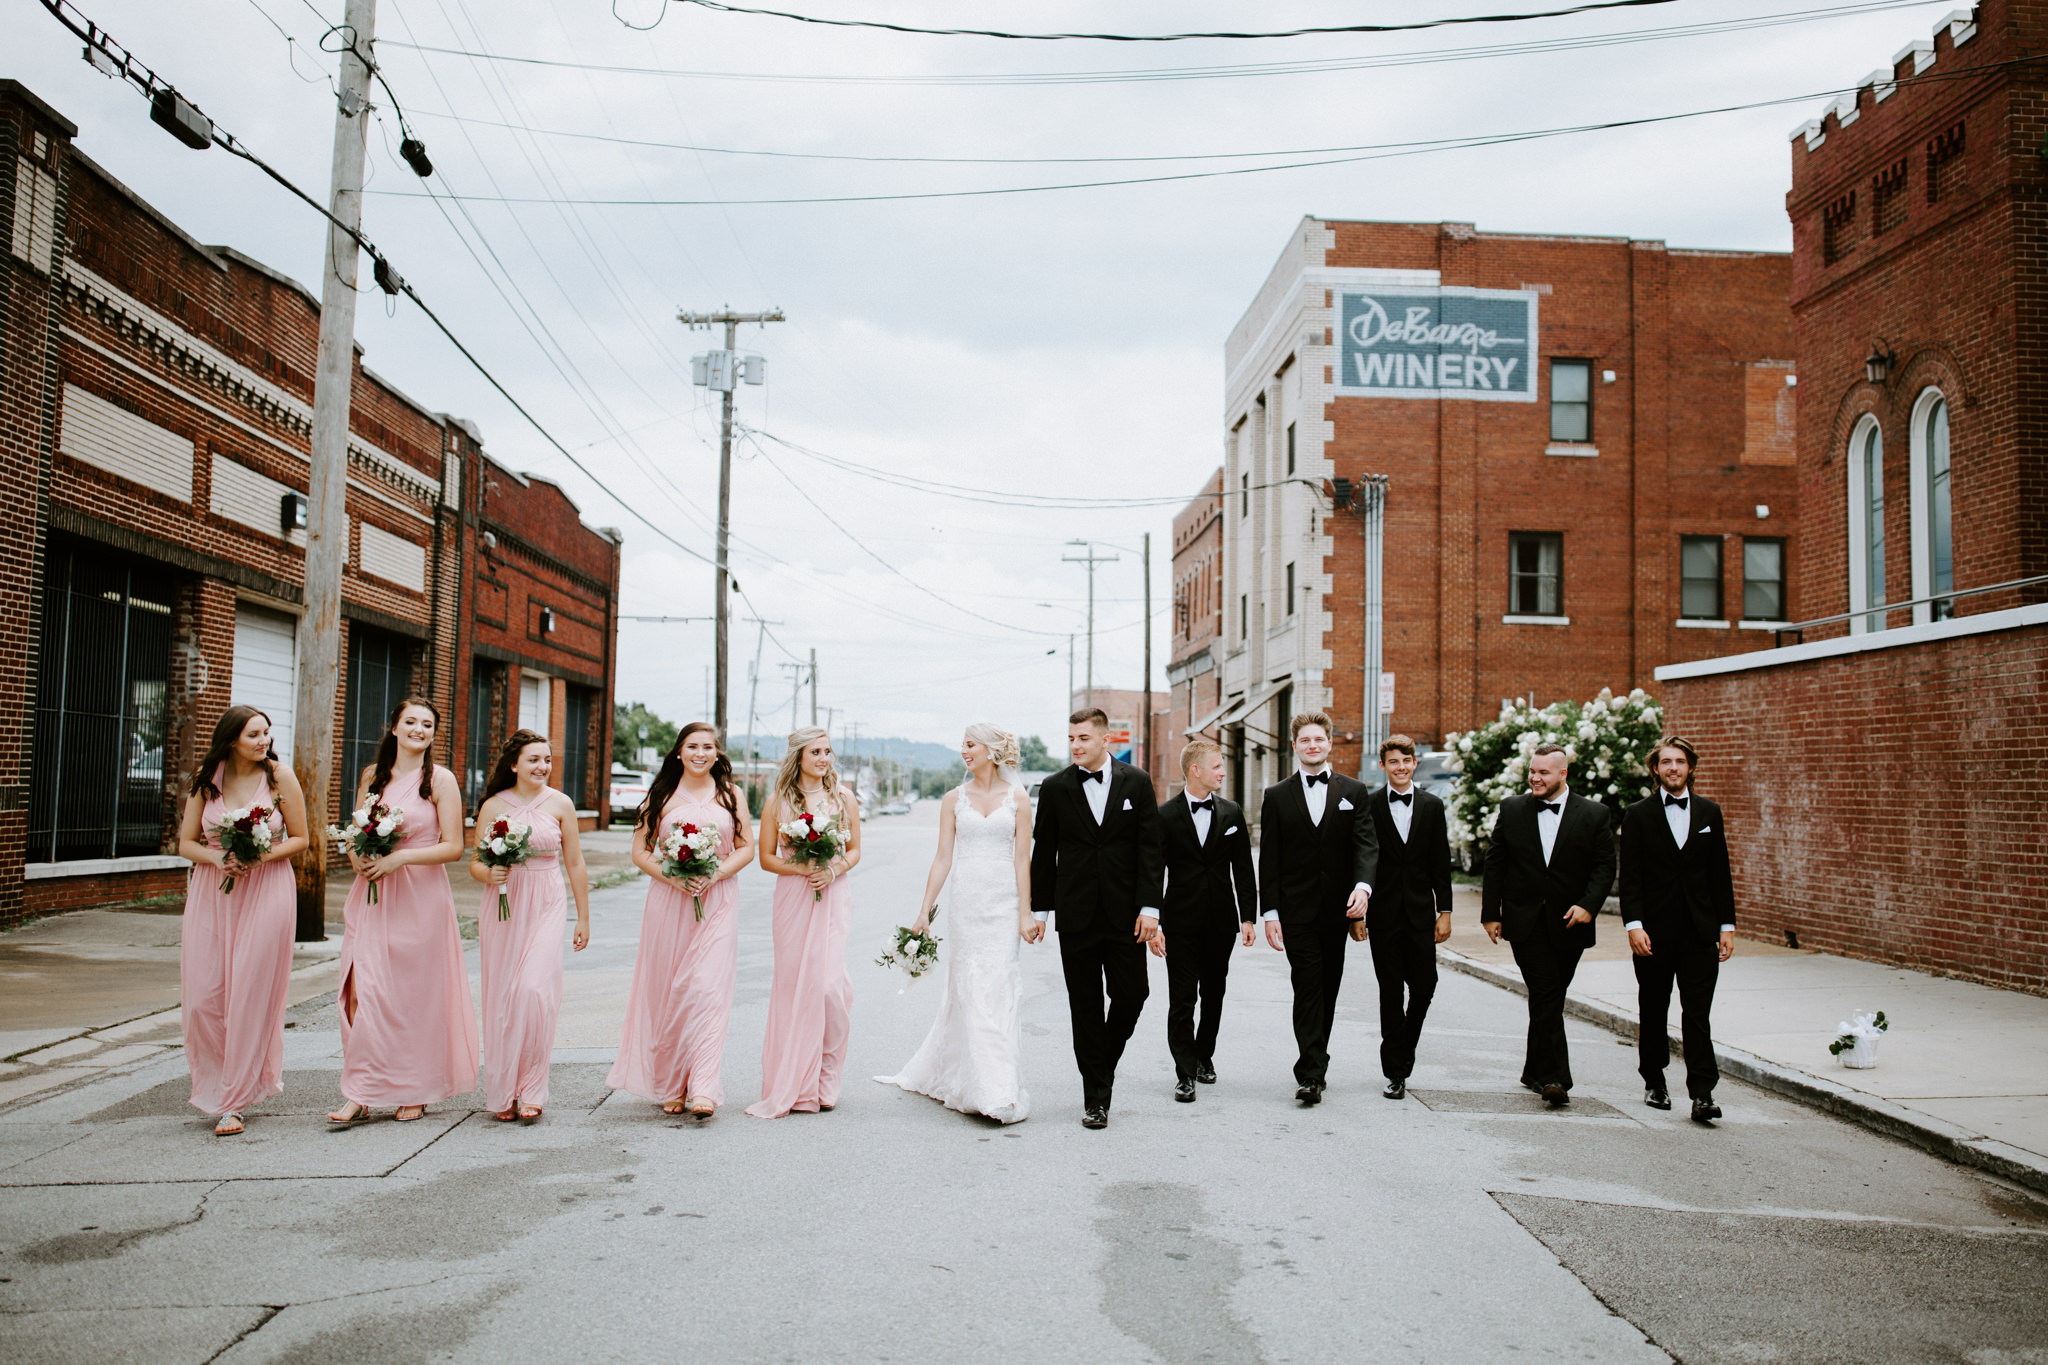 Kayley + Robert + Chattanooga + Nashville + Tennessee + Wedding + Photographer-1-6.jpg